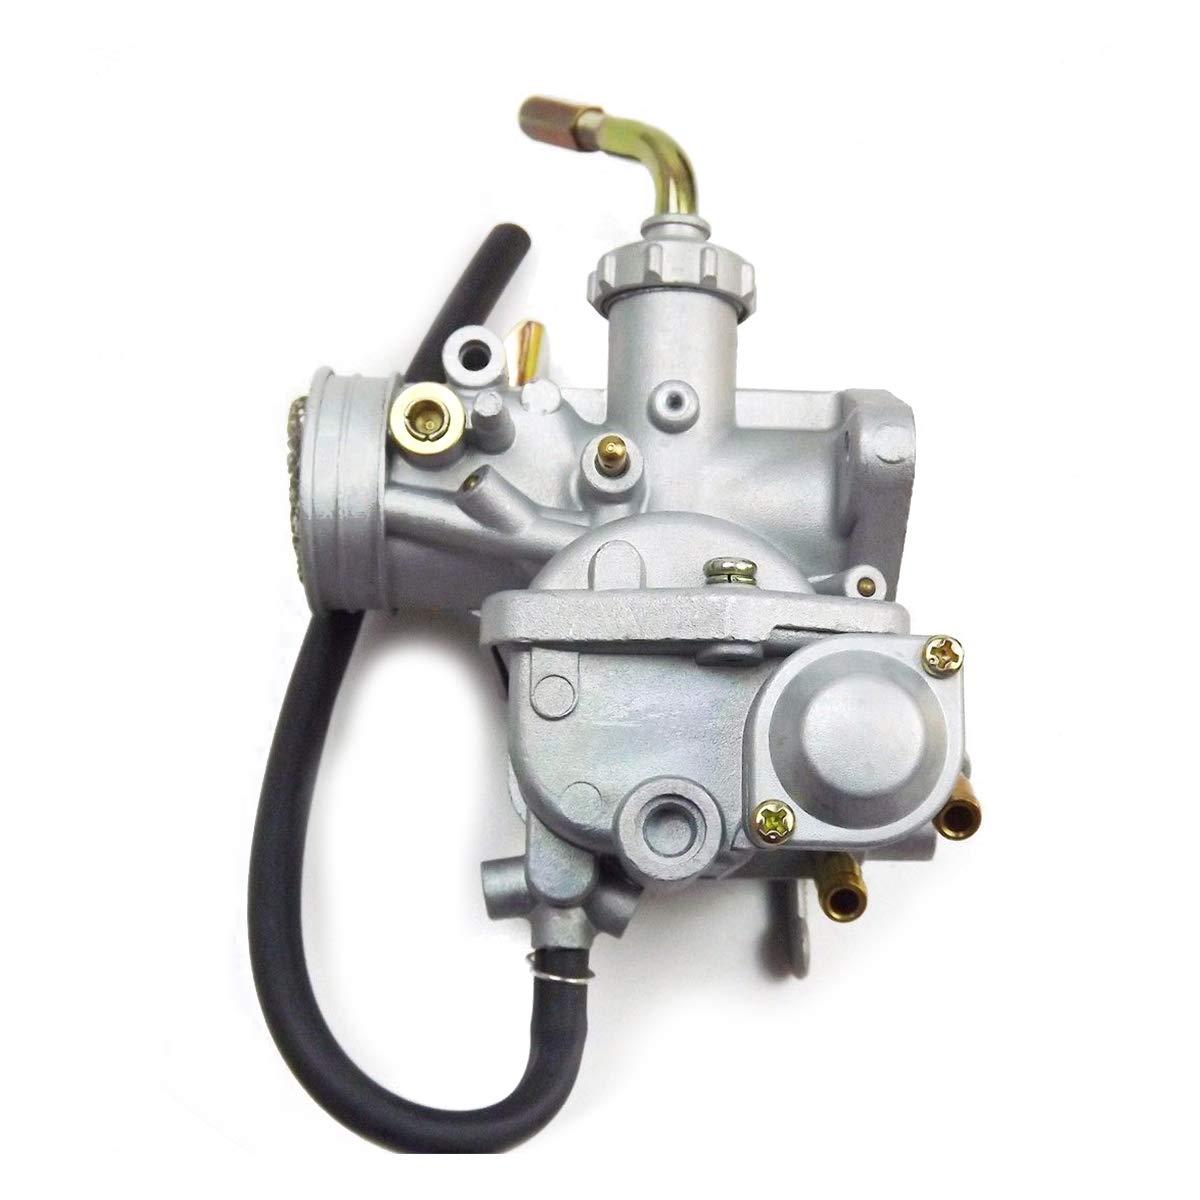 Carburetor for Honda CT70 CT70H CT 70 KO 1969-1977 Trail Bike with Fuel Line